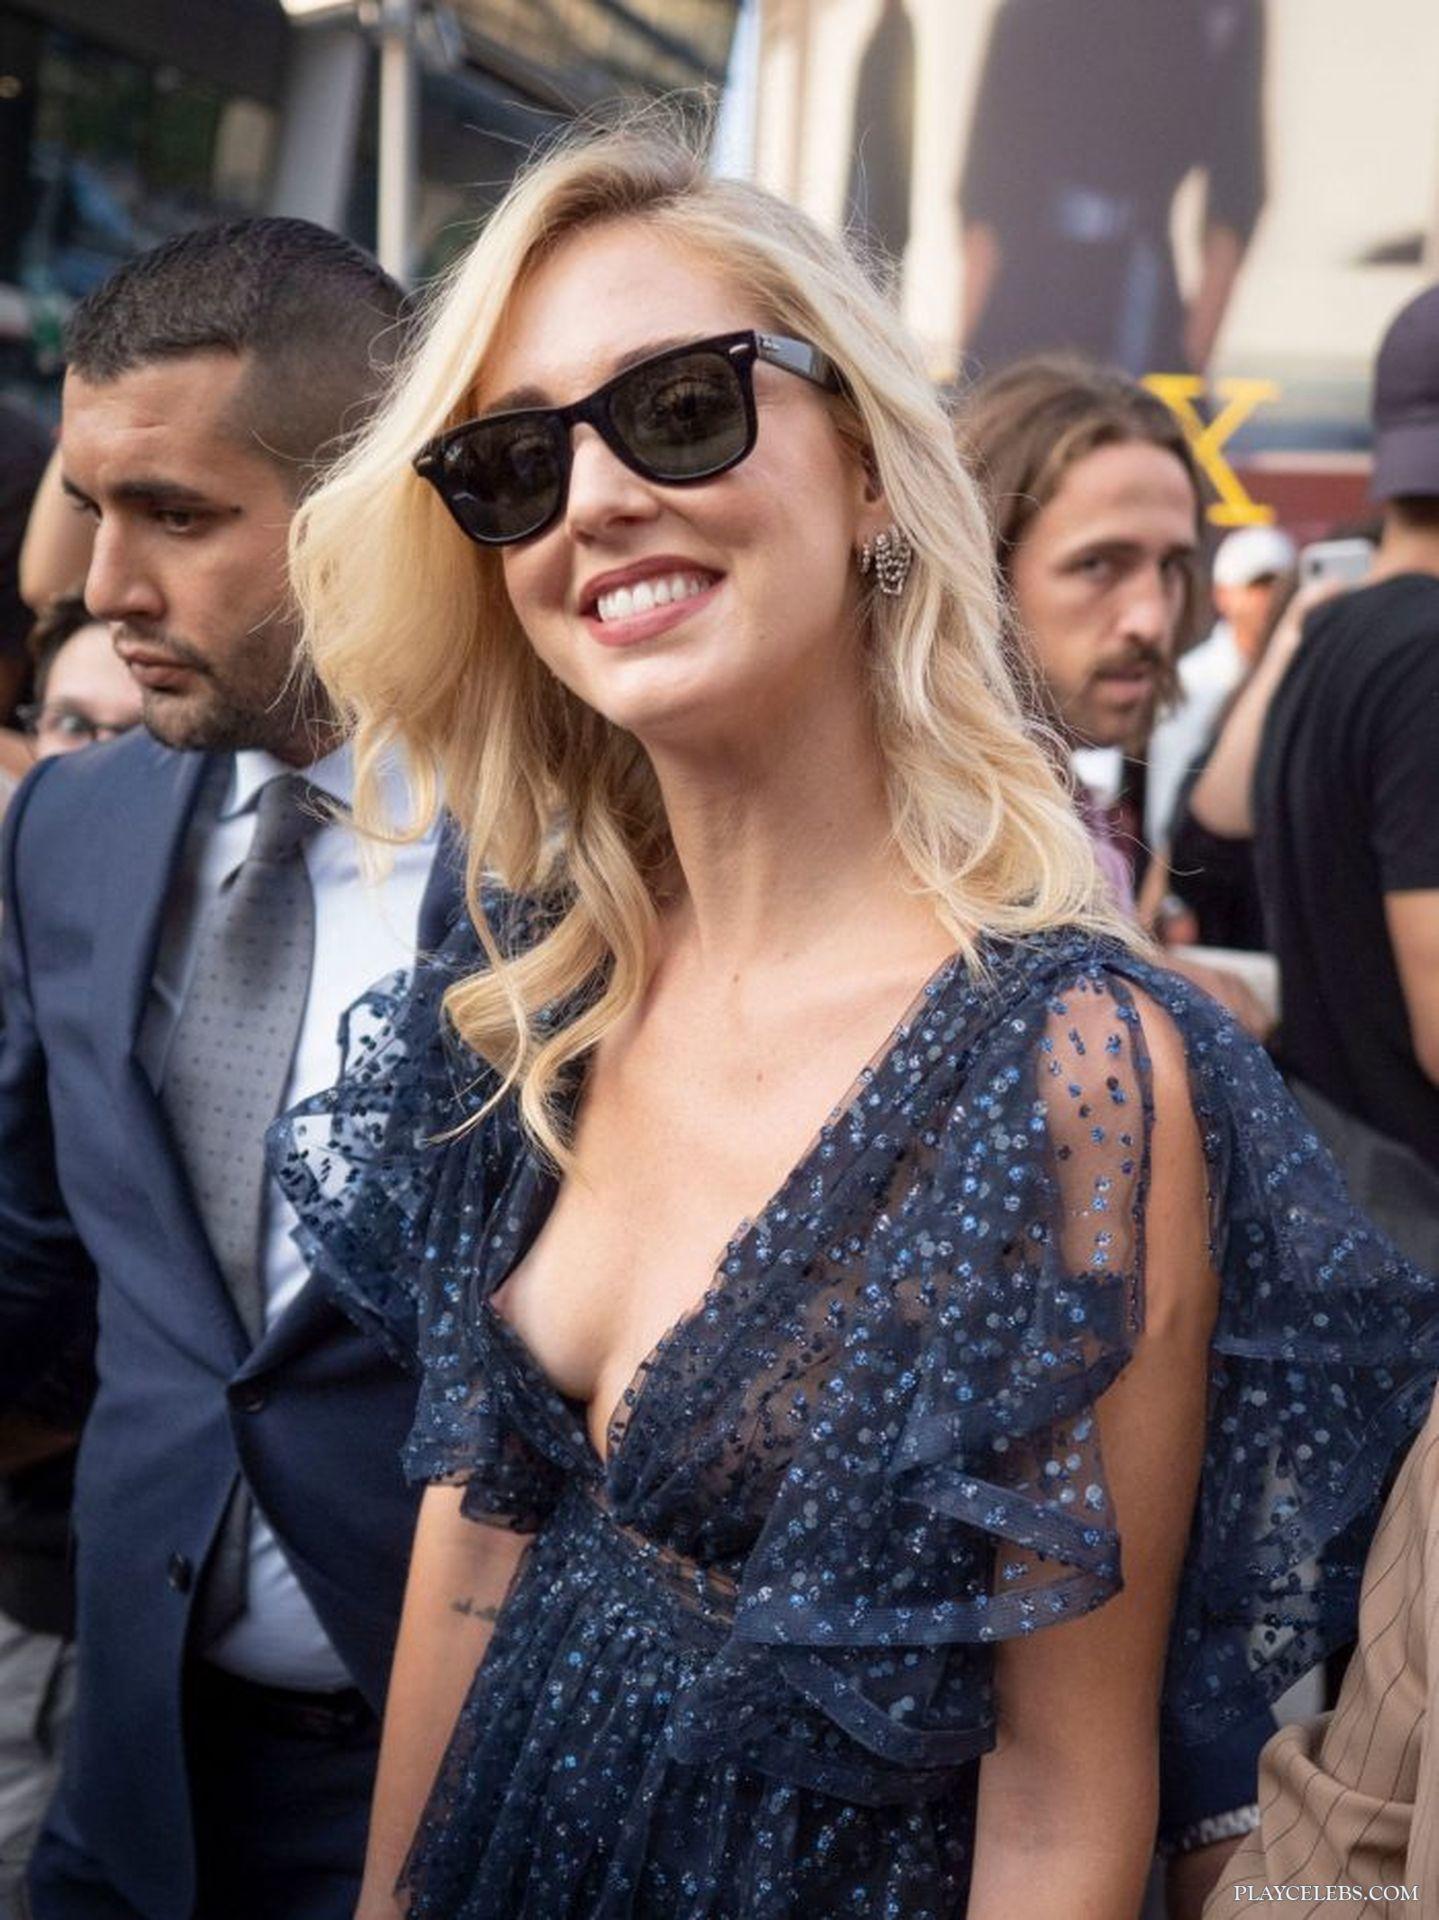 Chiara Ferragni Paparazzi Oops Photos